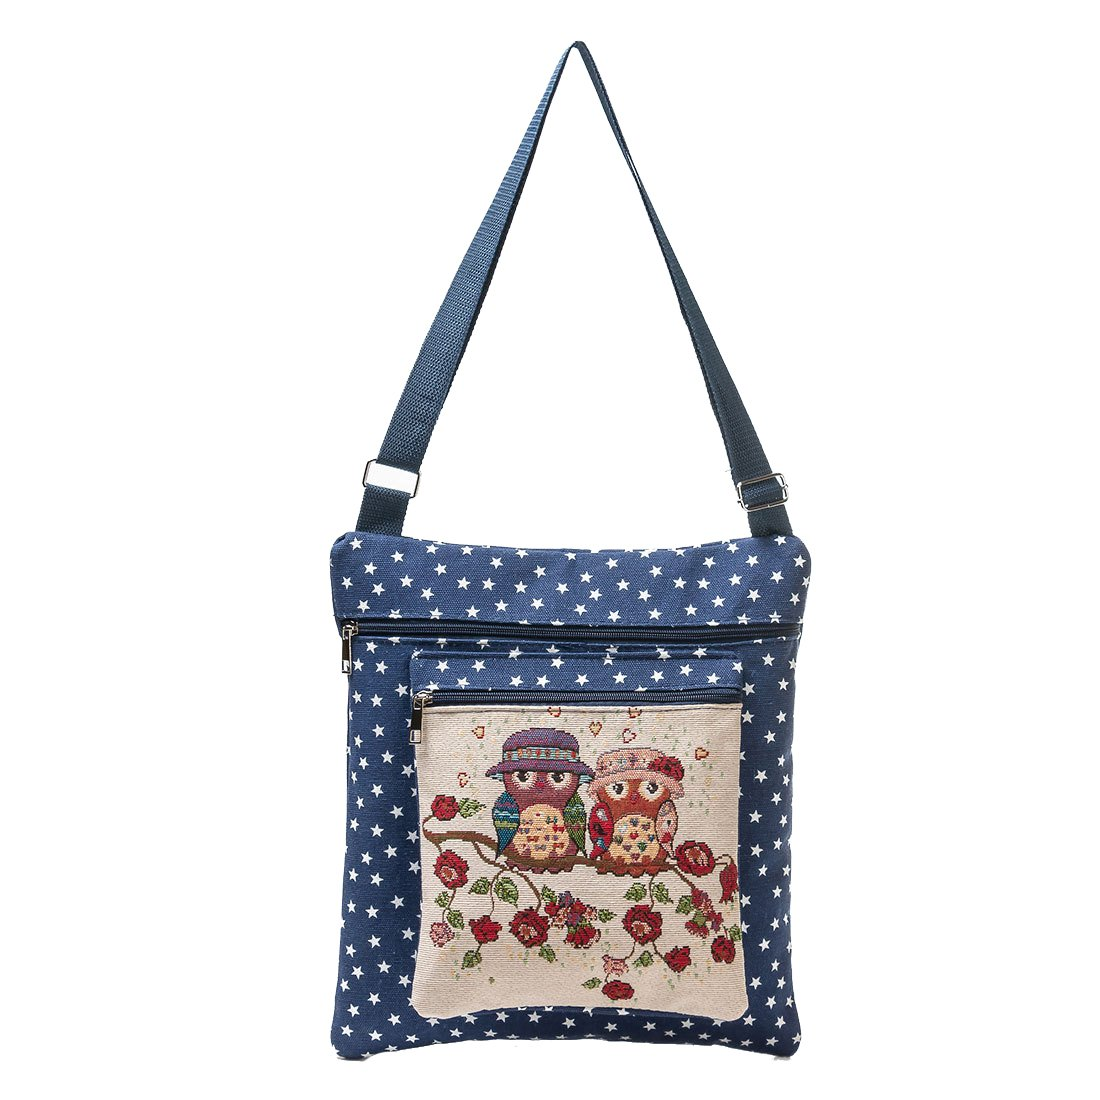 Dunland Women Shoulder bag Crossbody Collection Messenger Owl Stars Originality Travel Classic